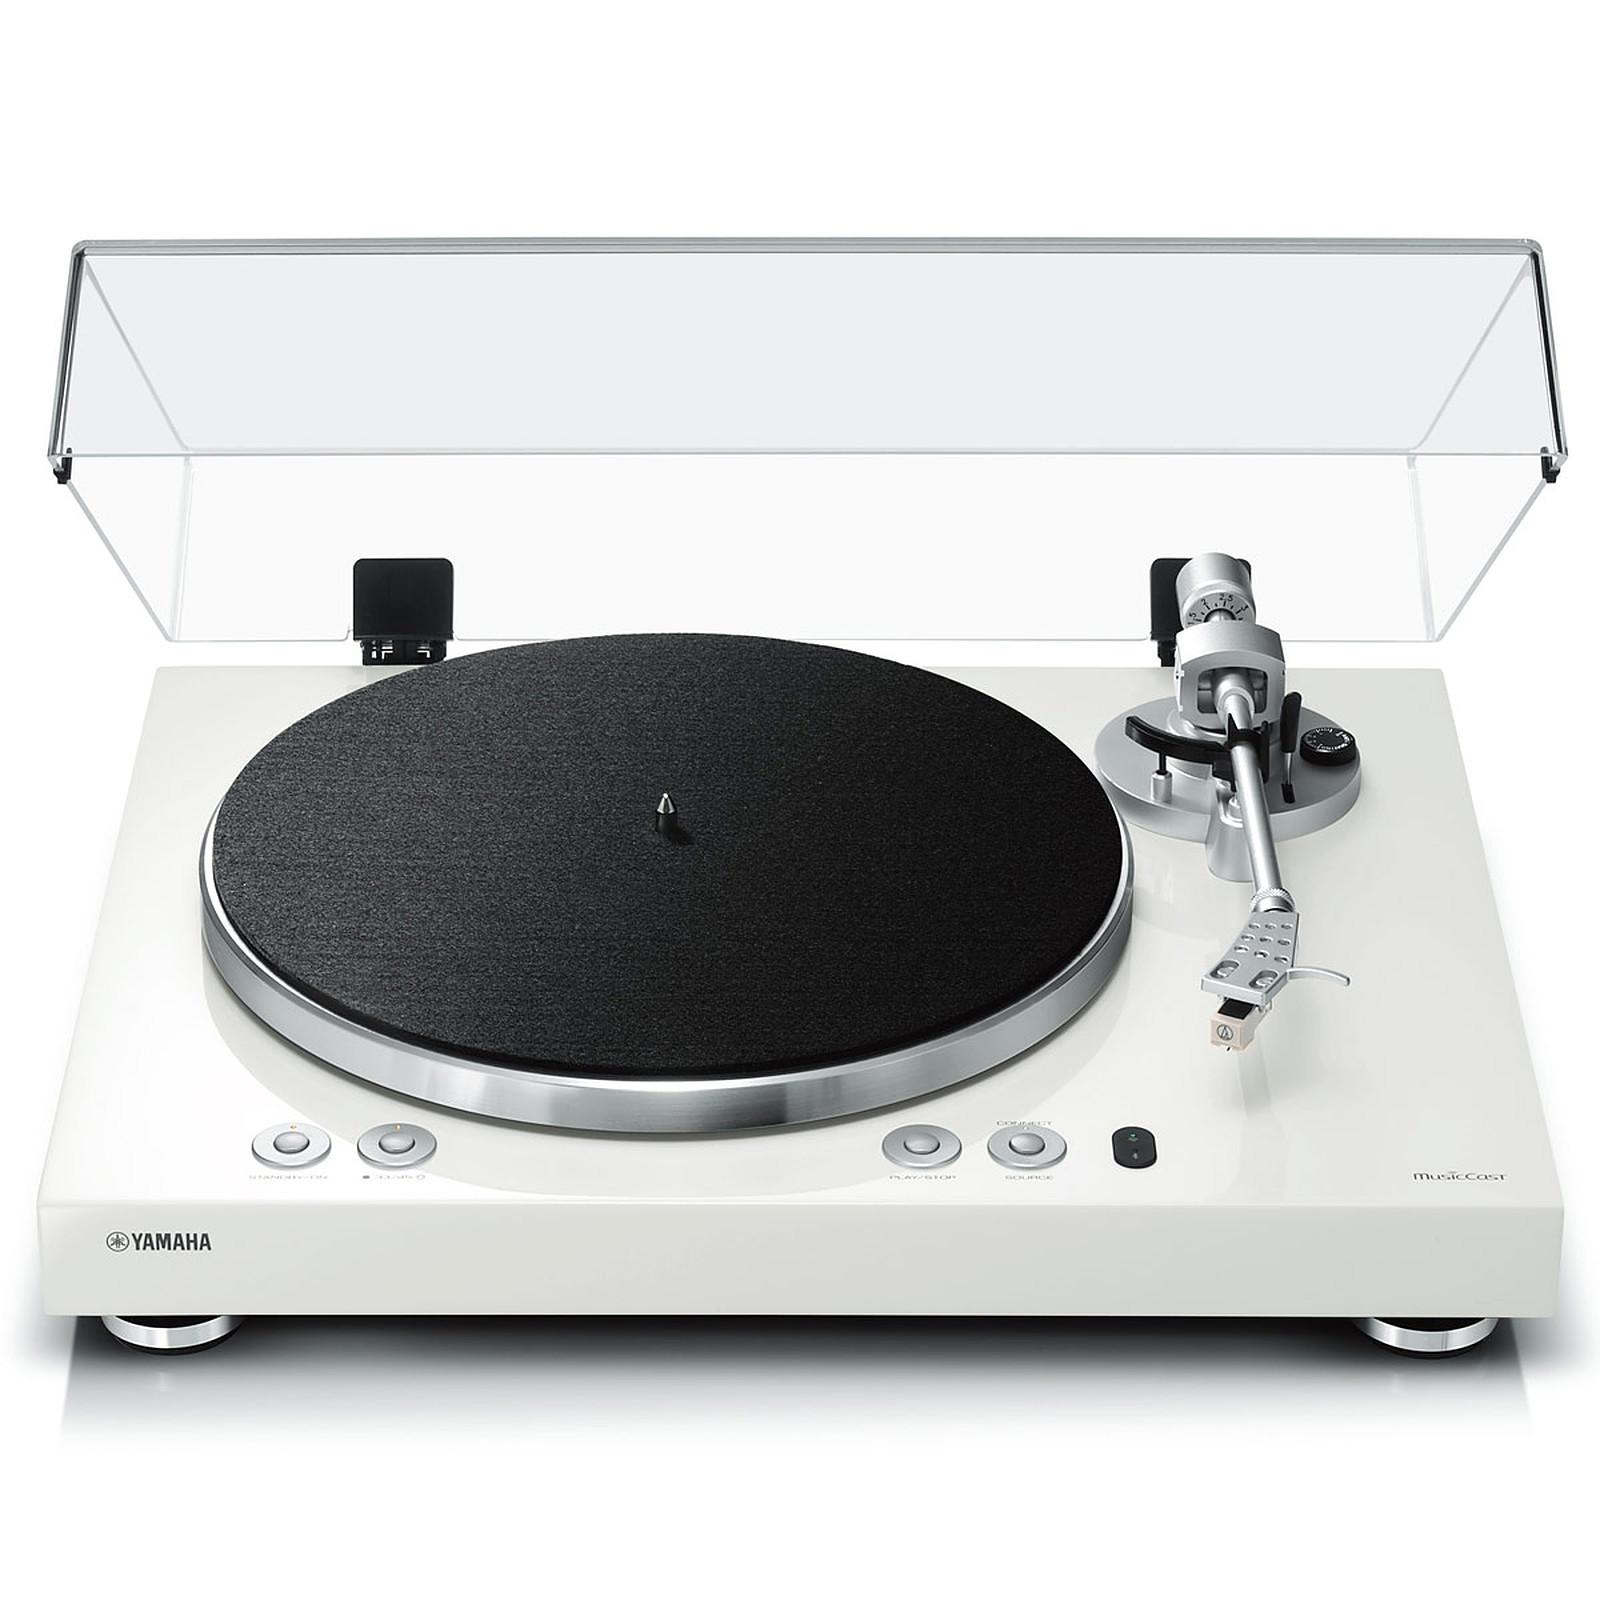 Yamaha MusicCast VINYL 500 Blanco - Tocadiscos vinilo Yamaha en LDLC.com |  ¡Musericordia!